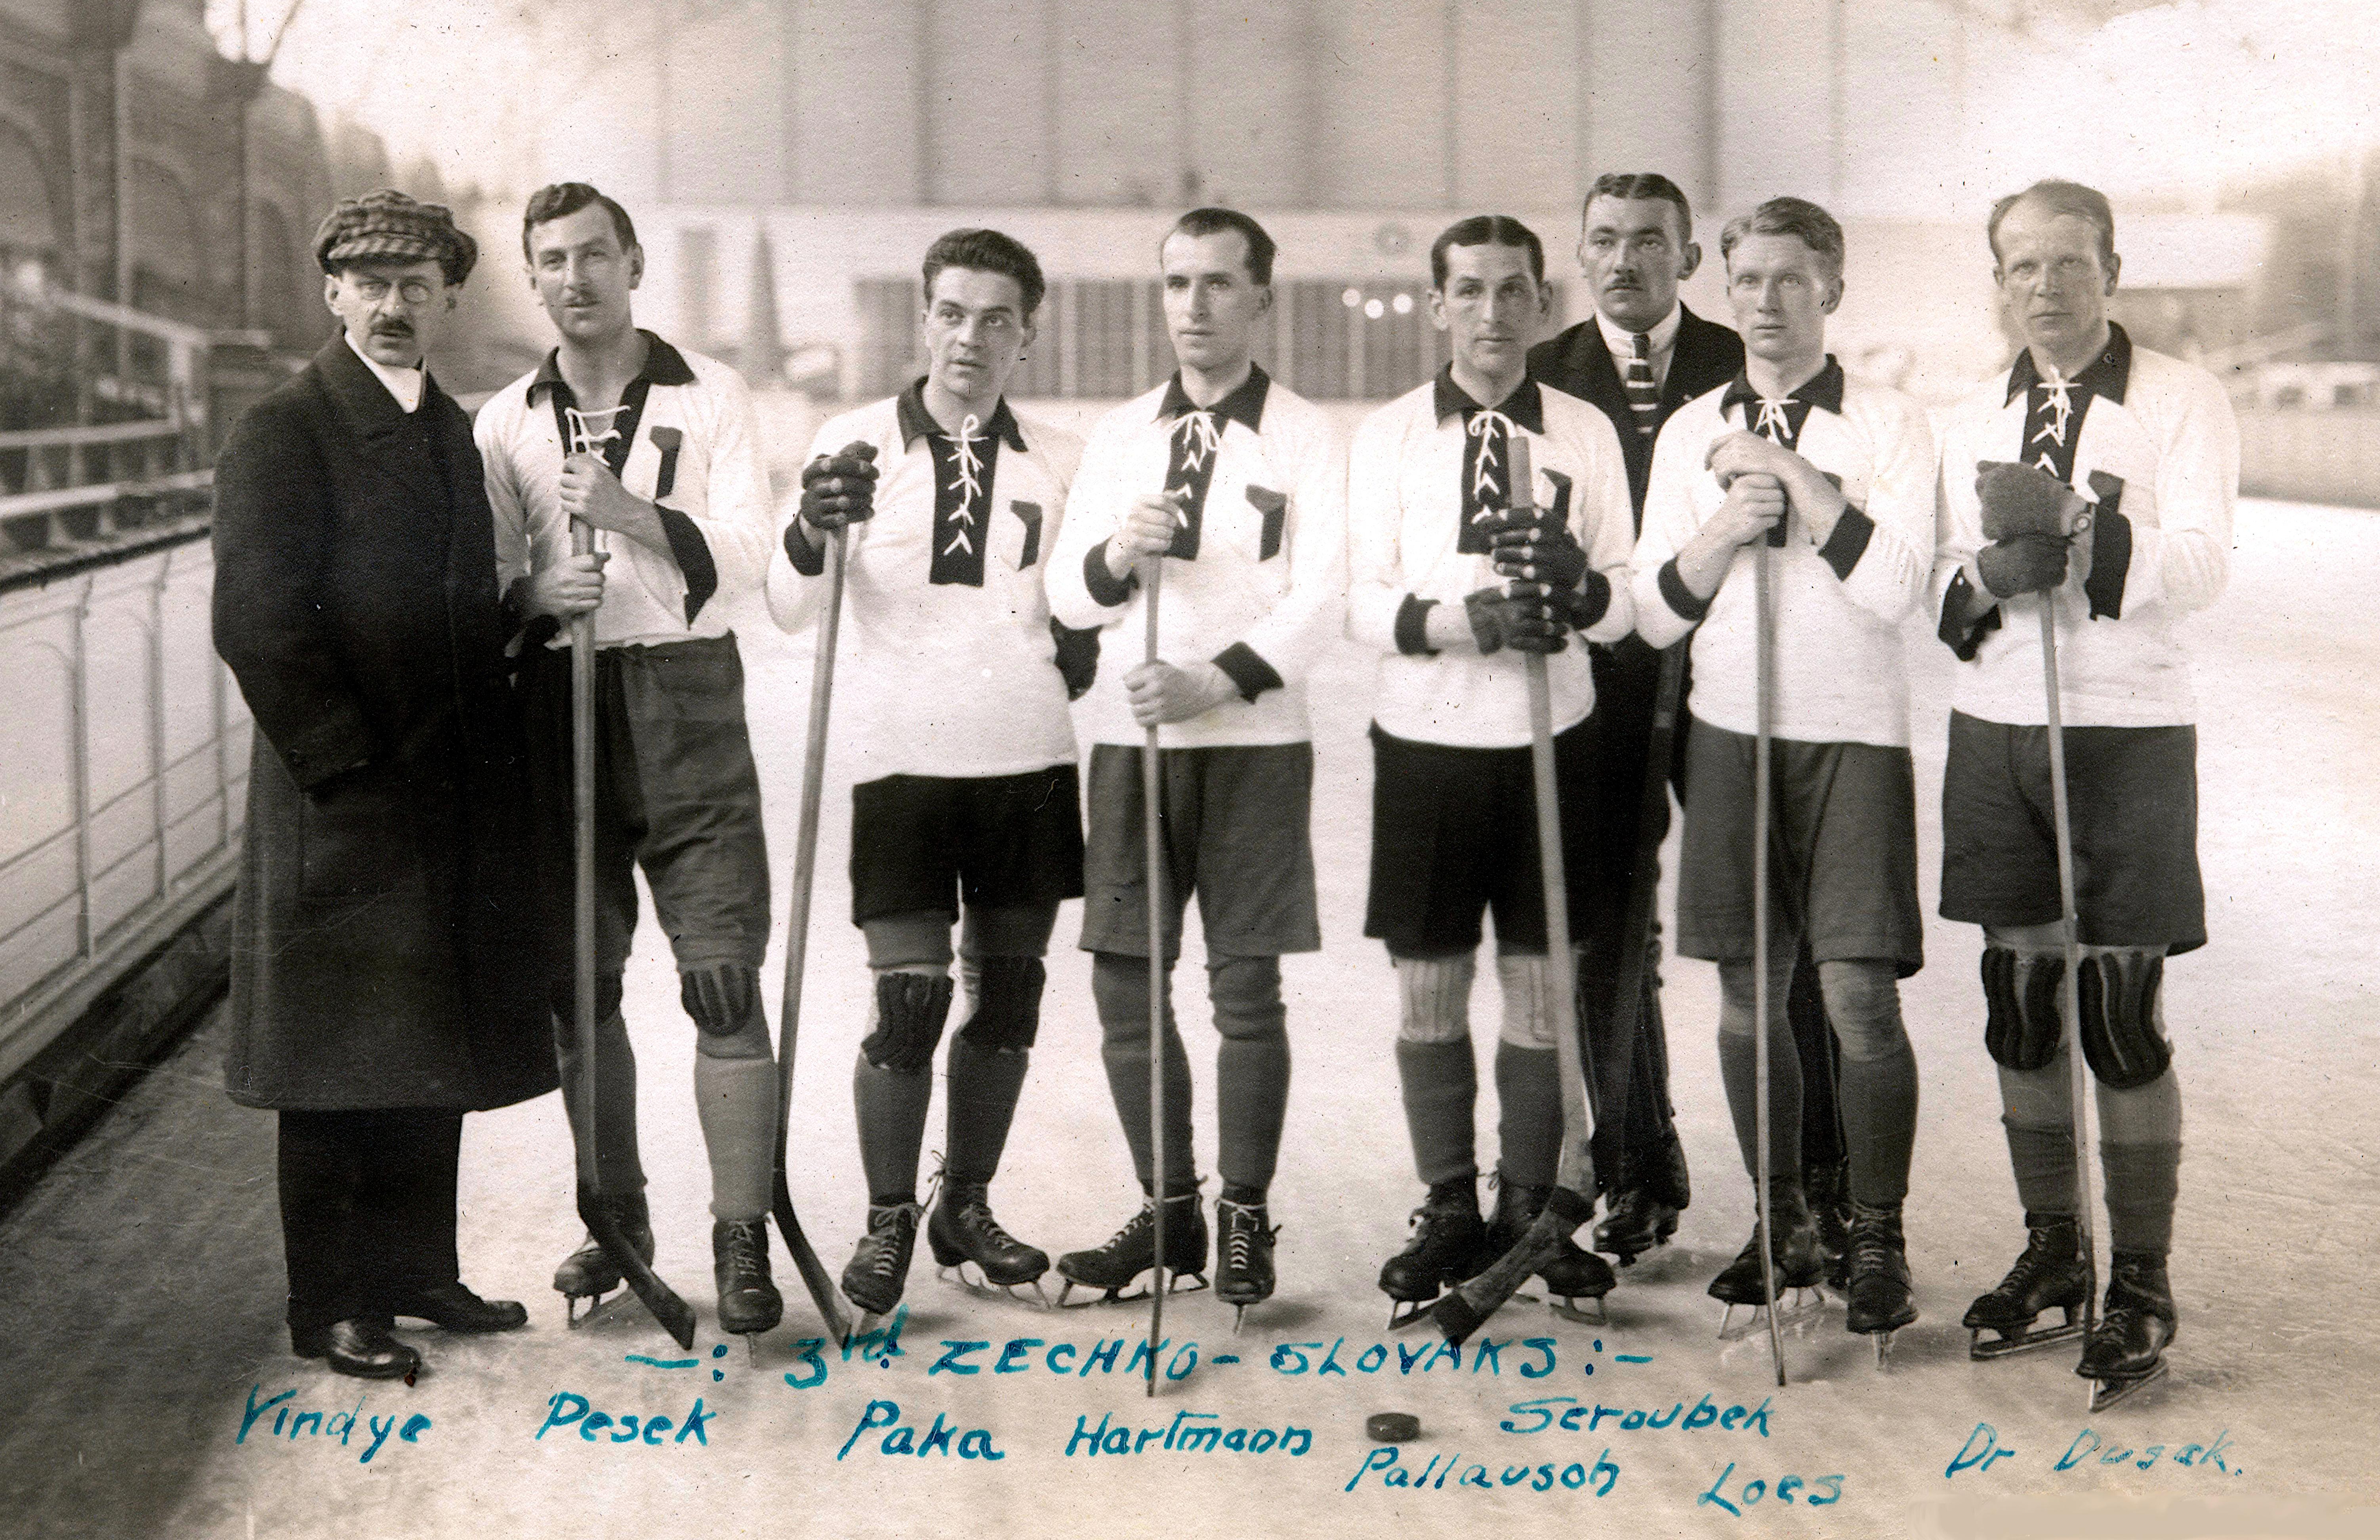 Ice hockey team in 1920